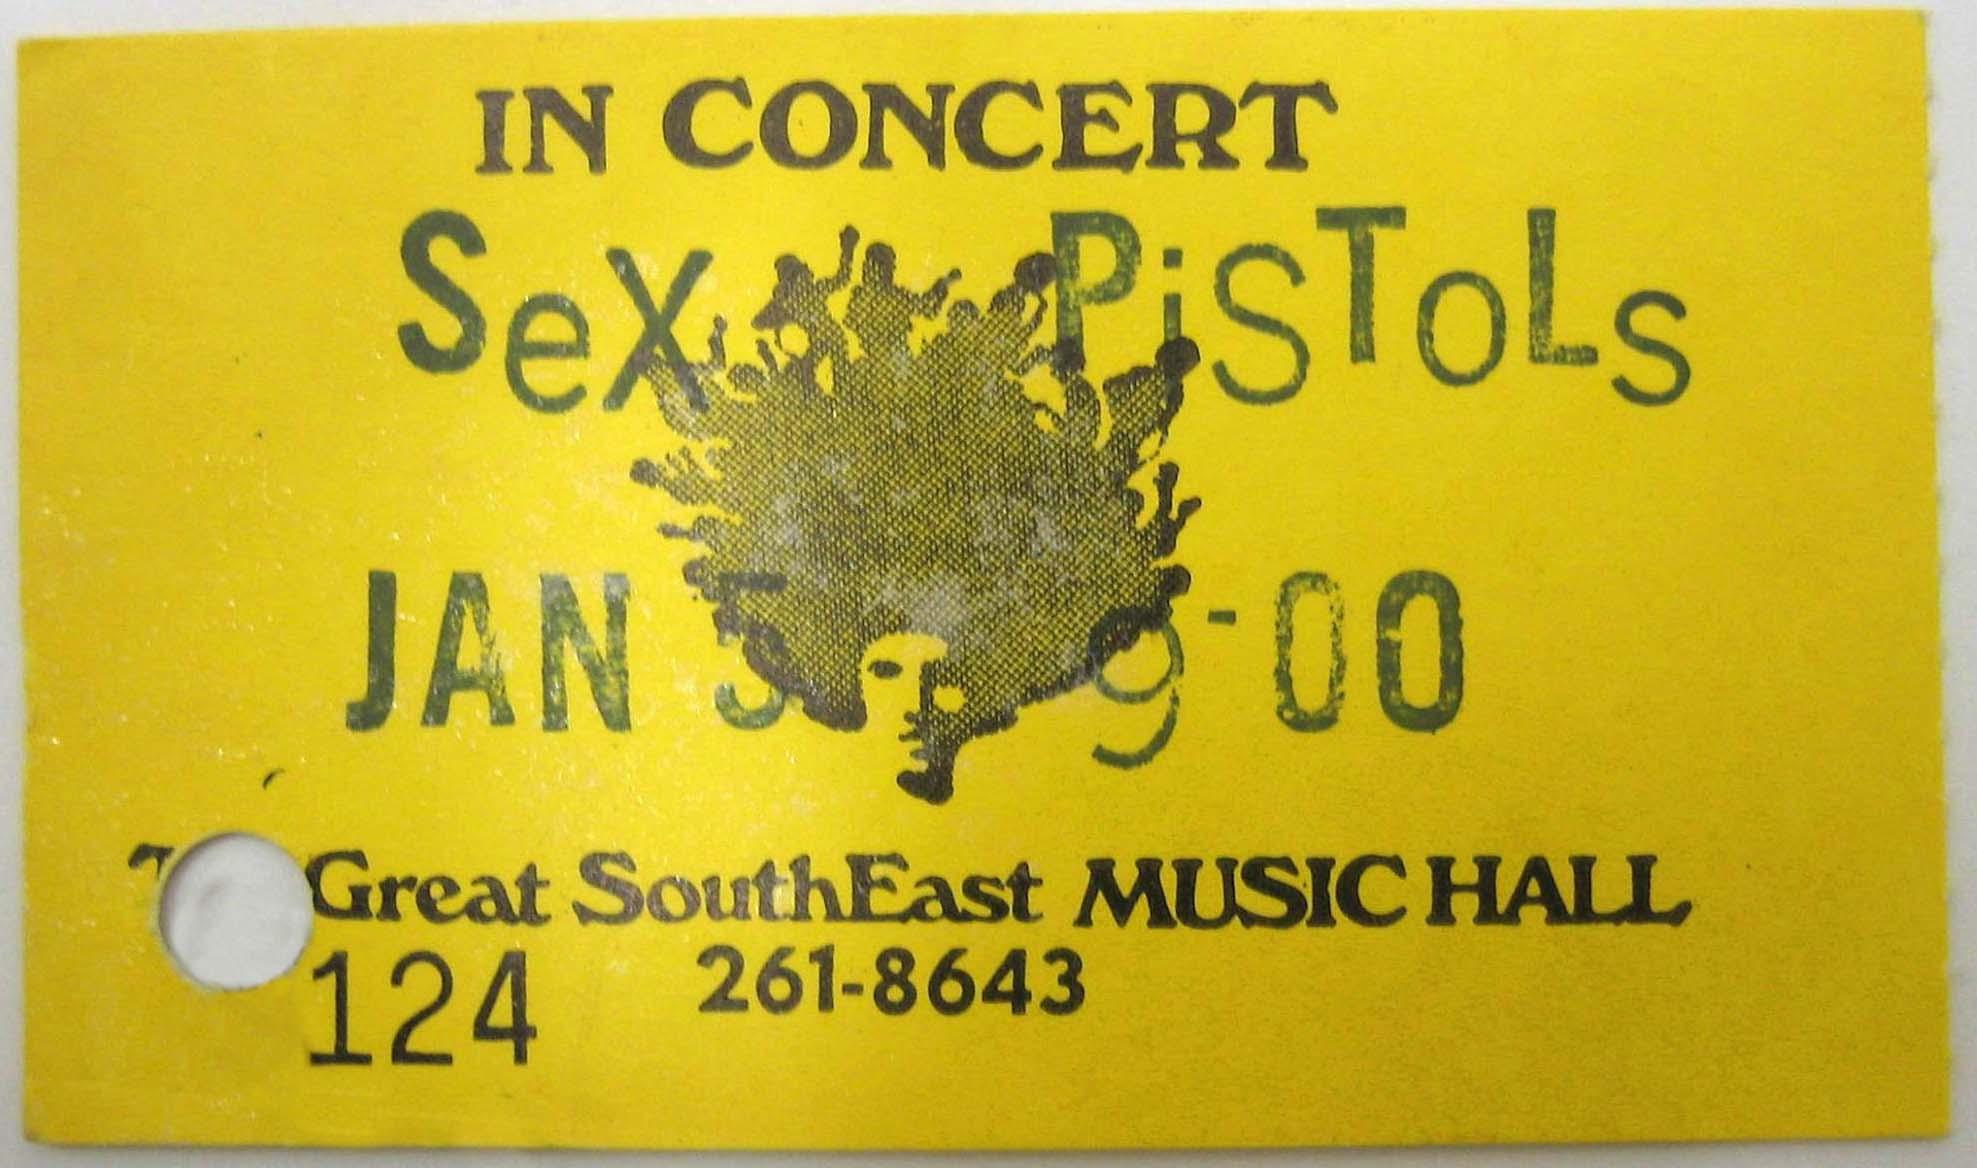 Great South East Music Hall, Atlanta, Georgia, USA, January 5th 1978 - Ticket